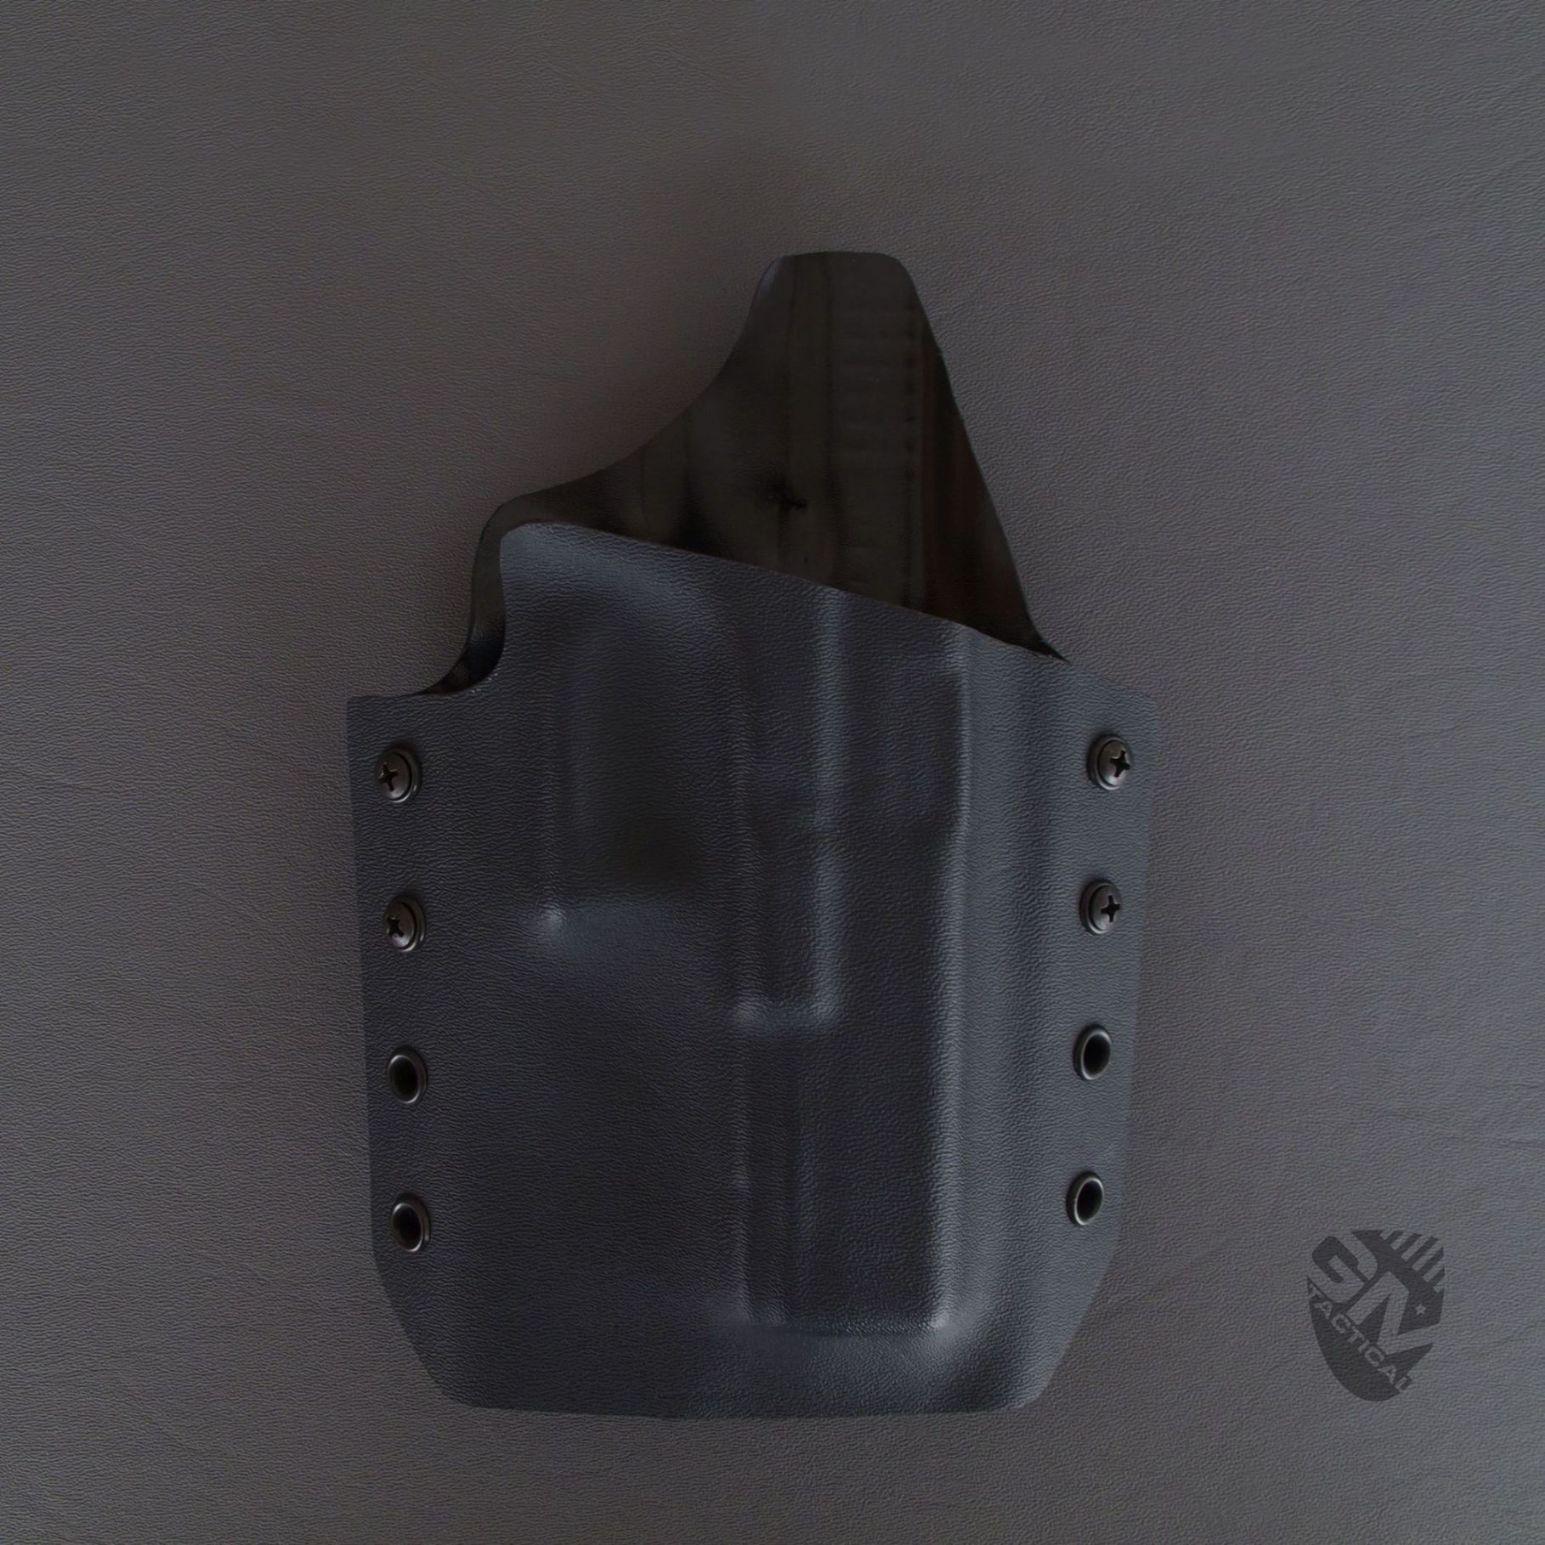 GM Tactical Glock 20 Kydex Holster - Black